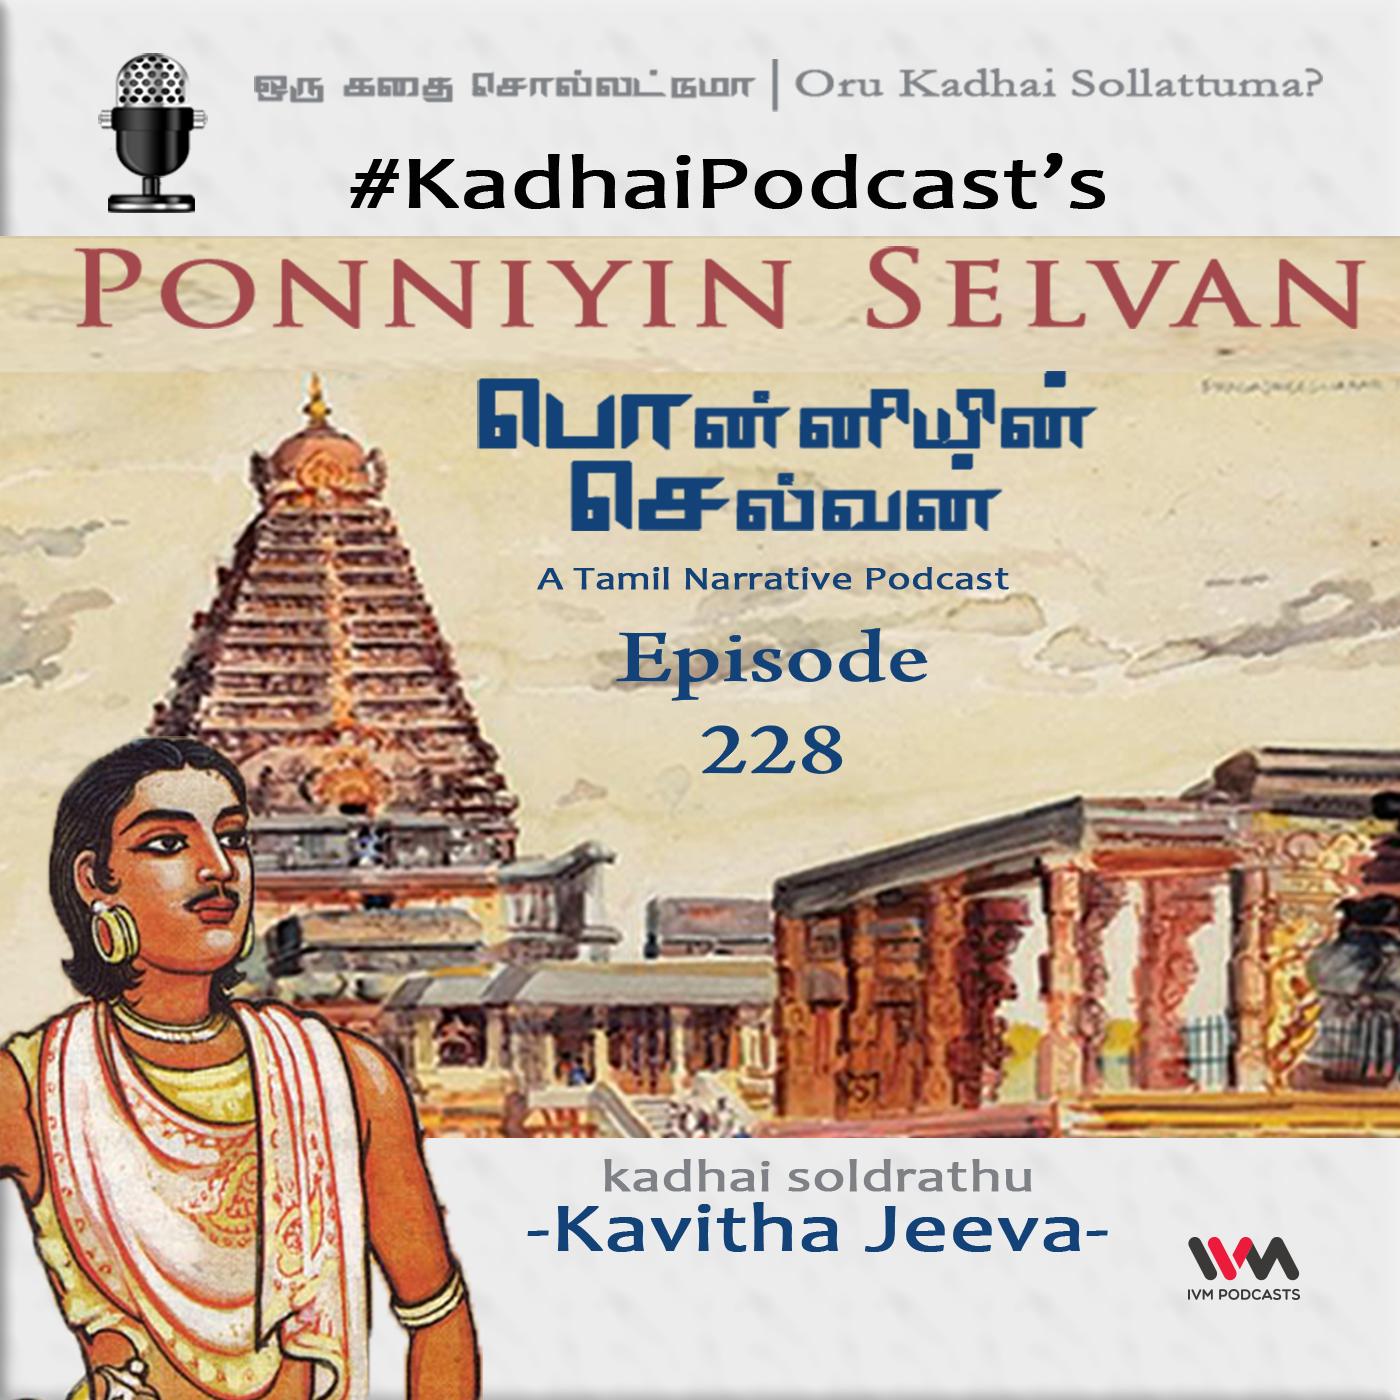 KadhaiPodcast's Ponniyin Selvan - Episode # 228